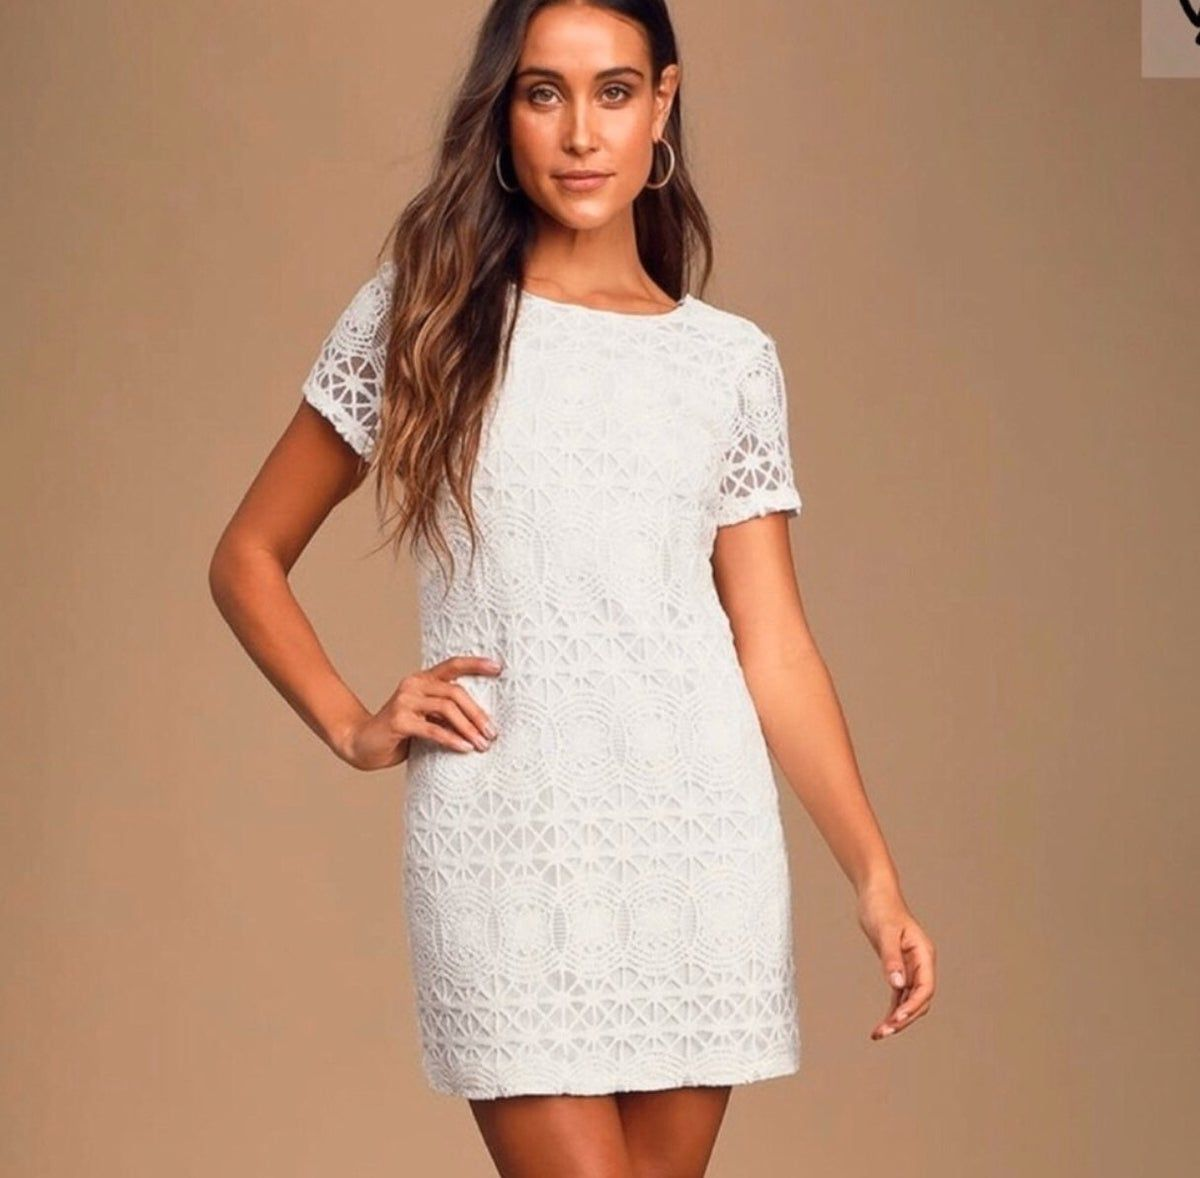 Lulus White Shift Dress Dresses White Shift Dresses Casual Summer Dresses [ 1178 x 1200 Pixel ]